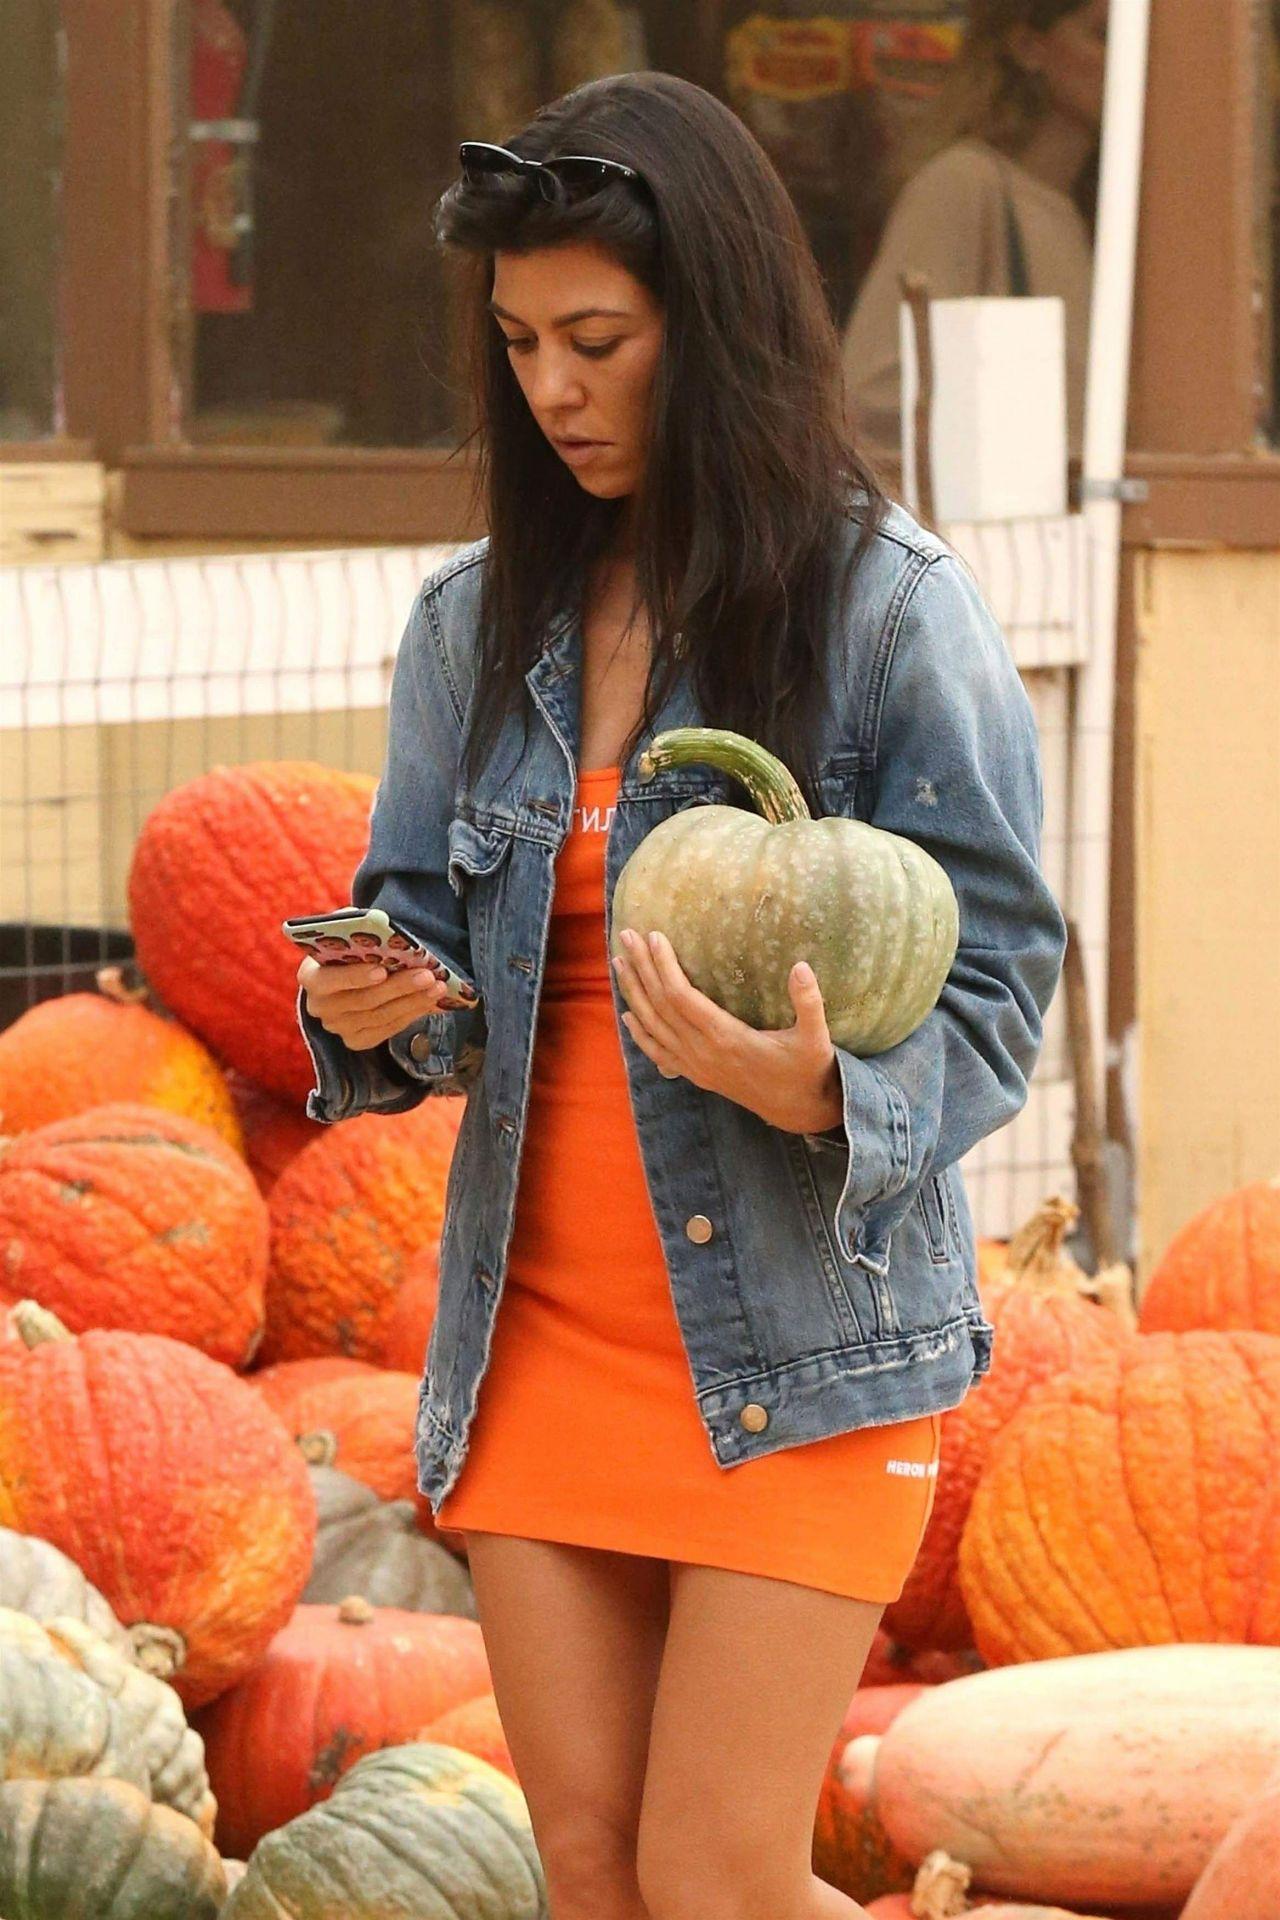 Kourtney Kardashian - Buy Pumpkins for Halloween in Moorpark, CA 10/29/2017